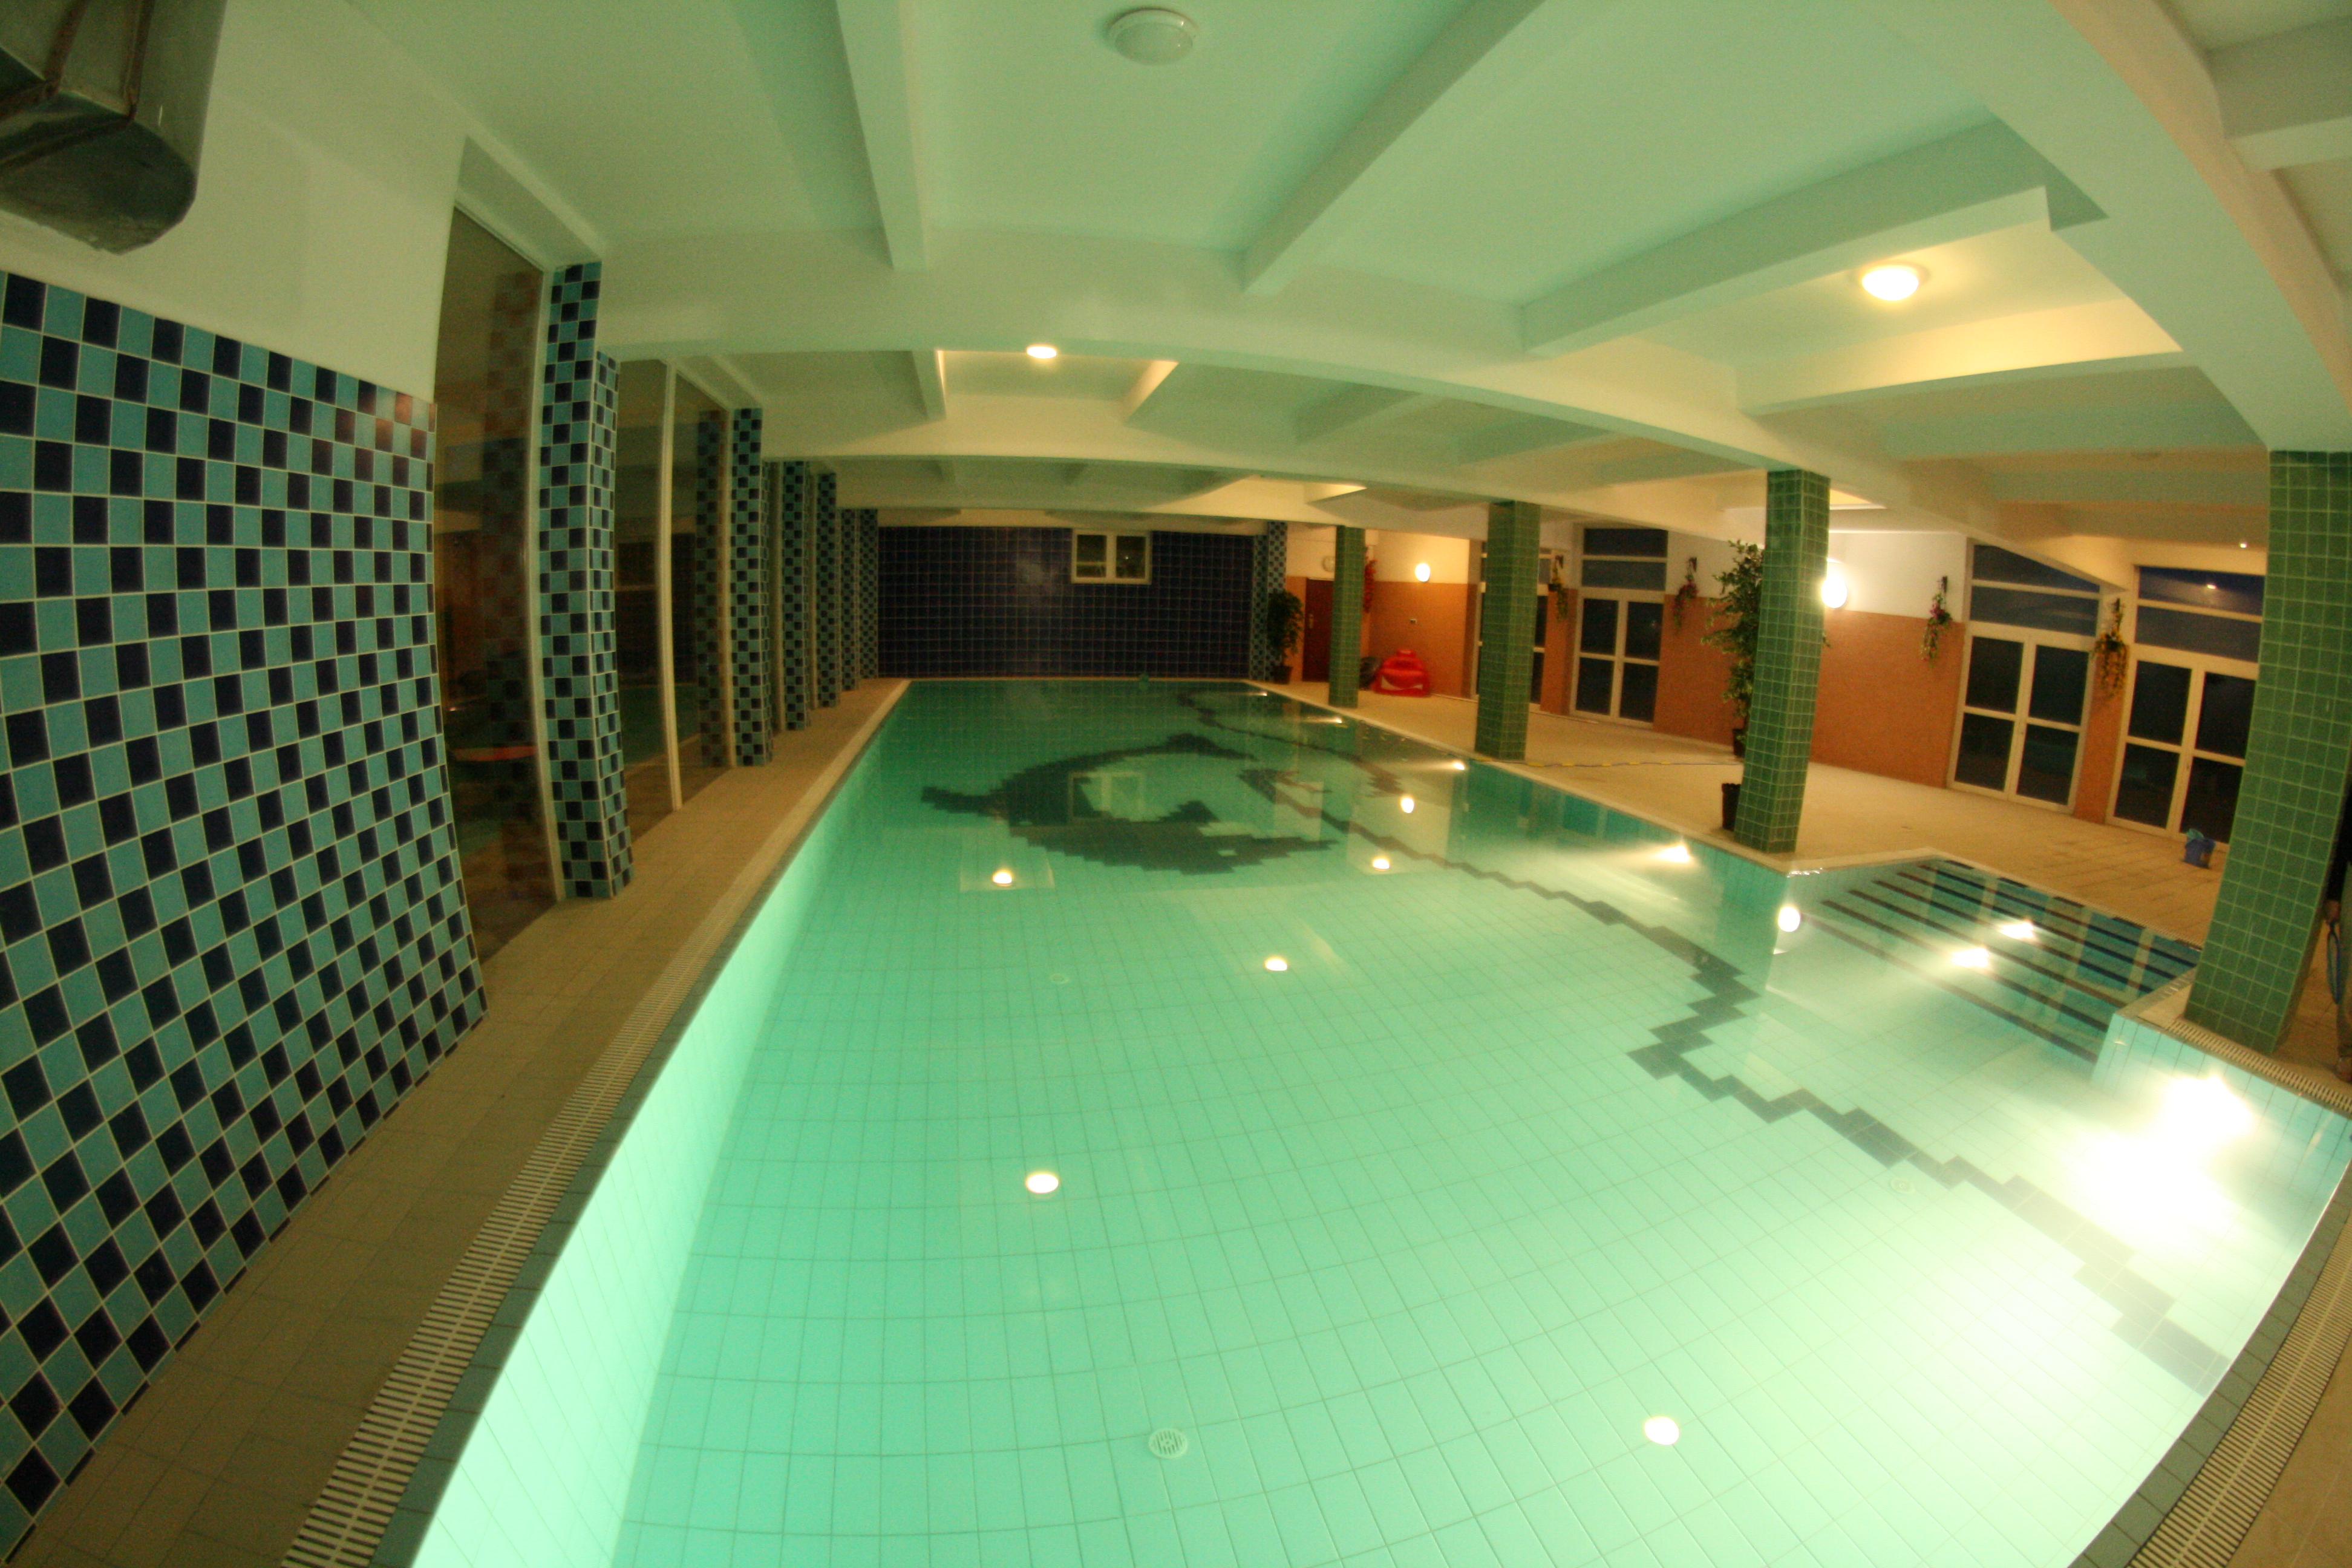 Swimming pool - closed